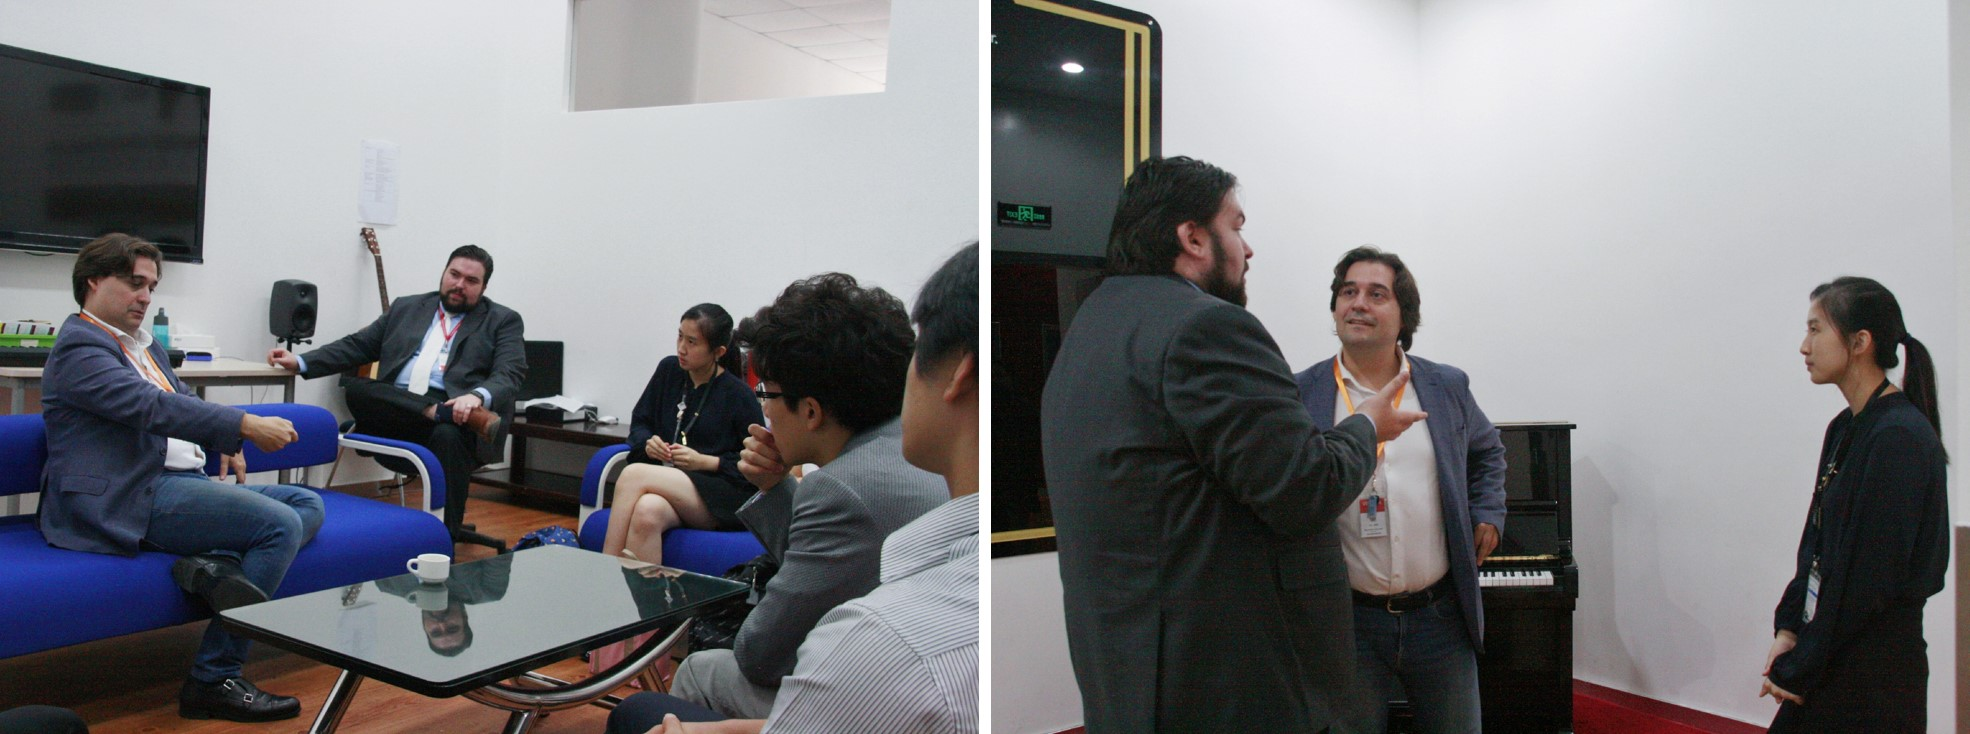 mr-pablo-mielgo-with-dcb-teacher-and-students-3-北京德威英国国际学校